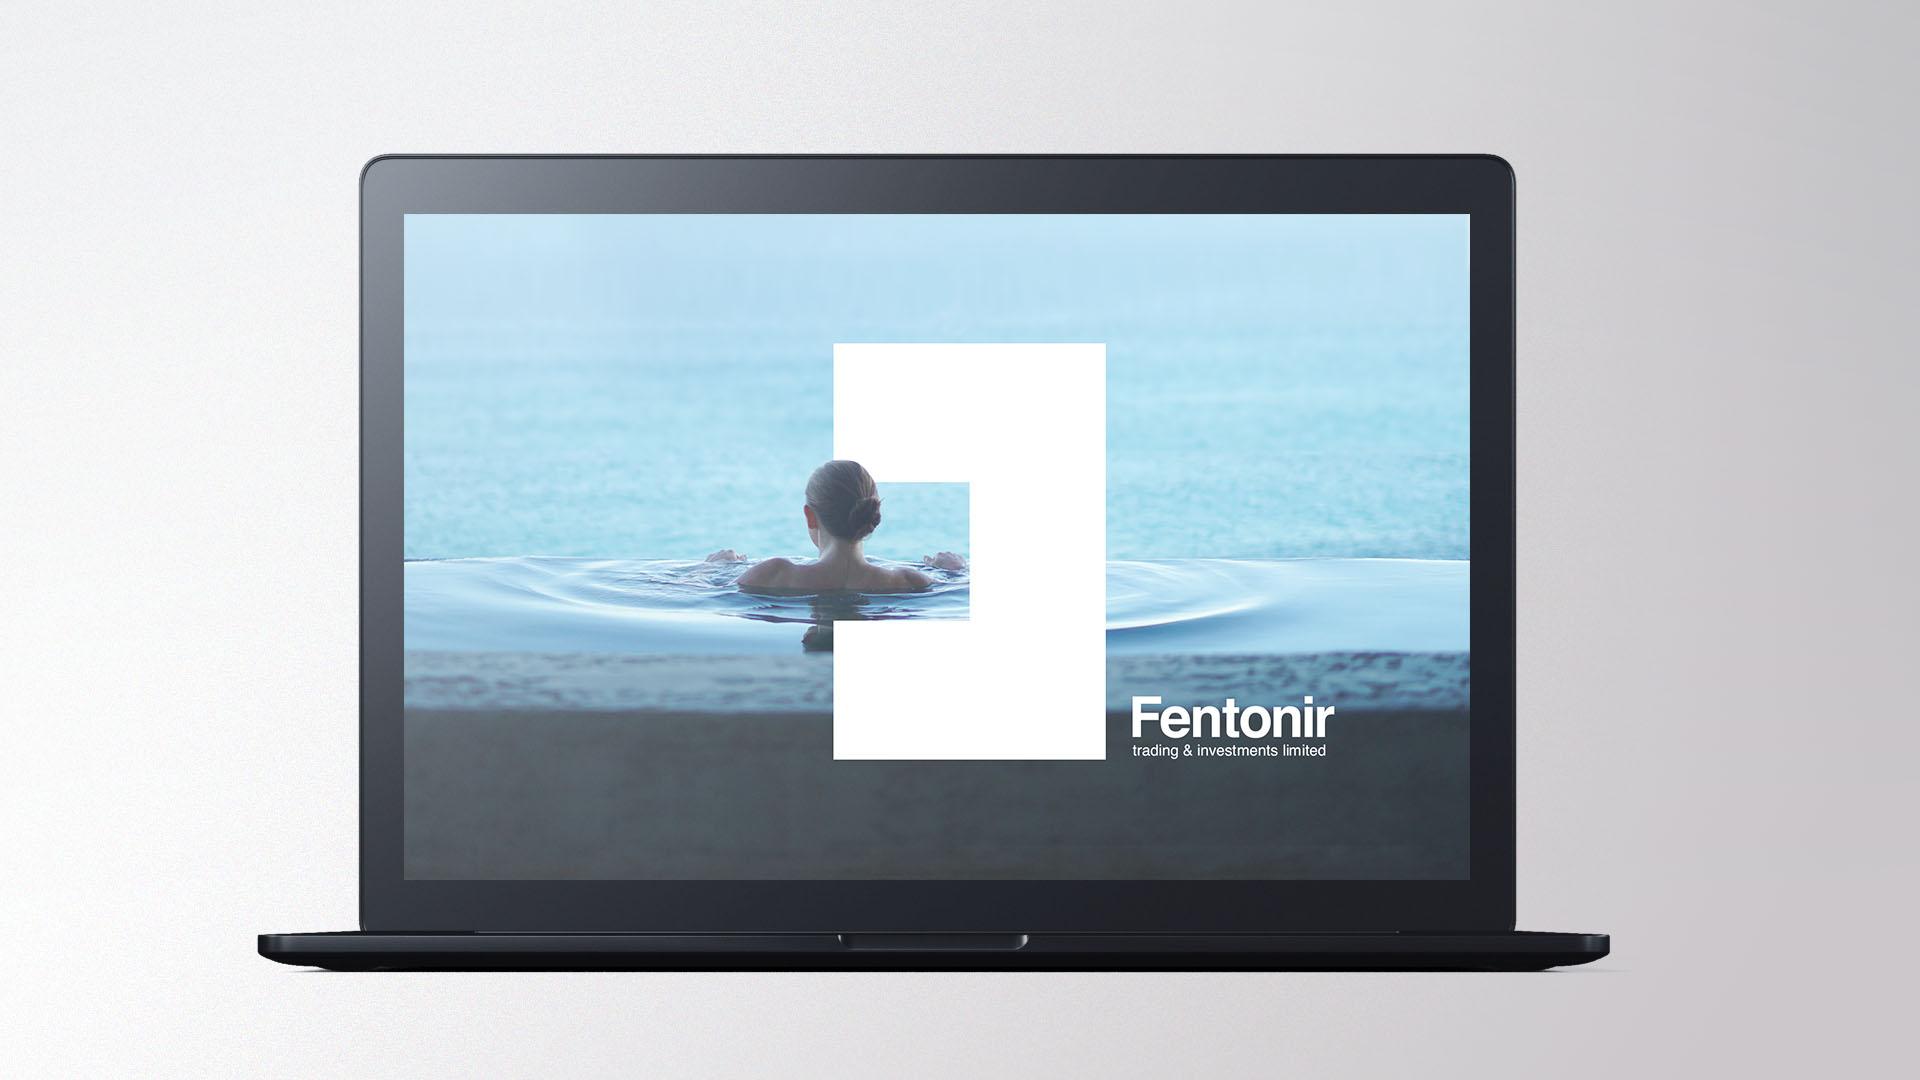 fentonir-presentation-concept-laptop-pool